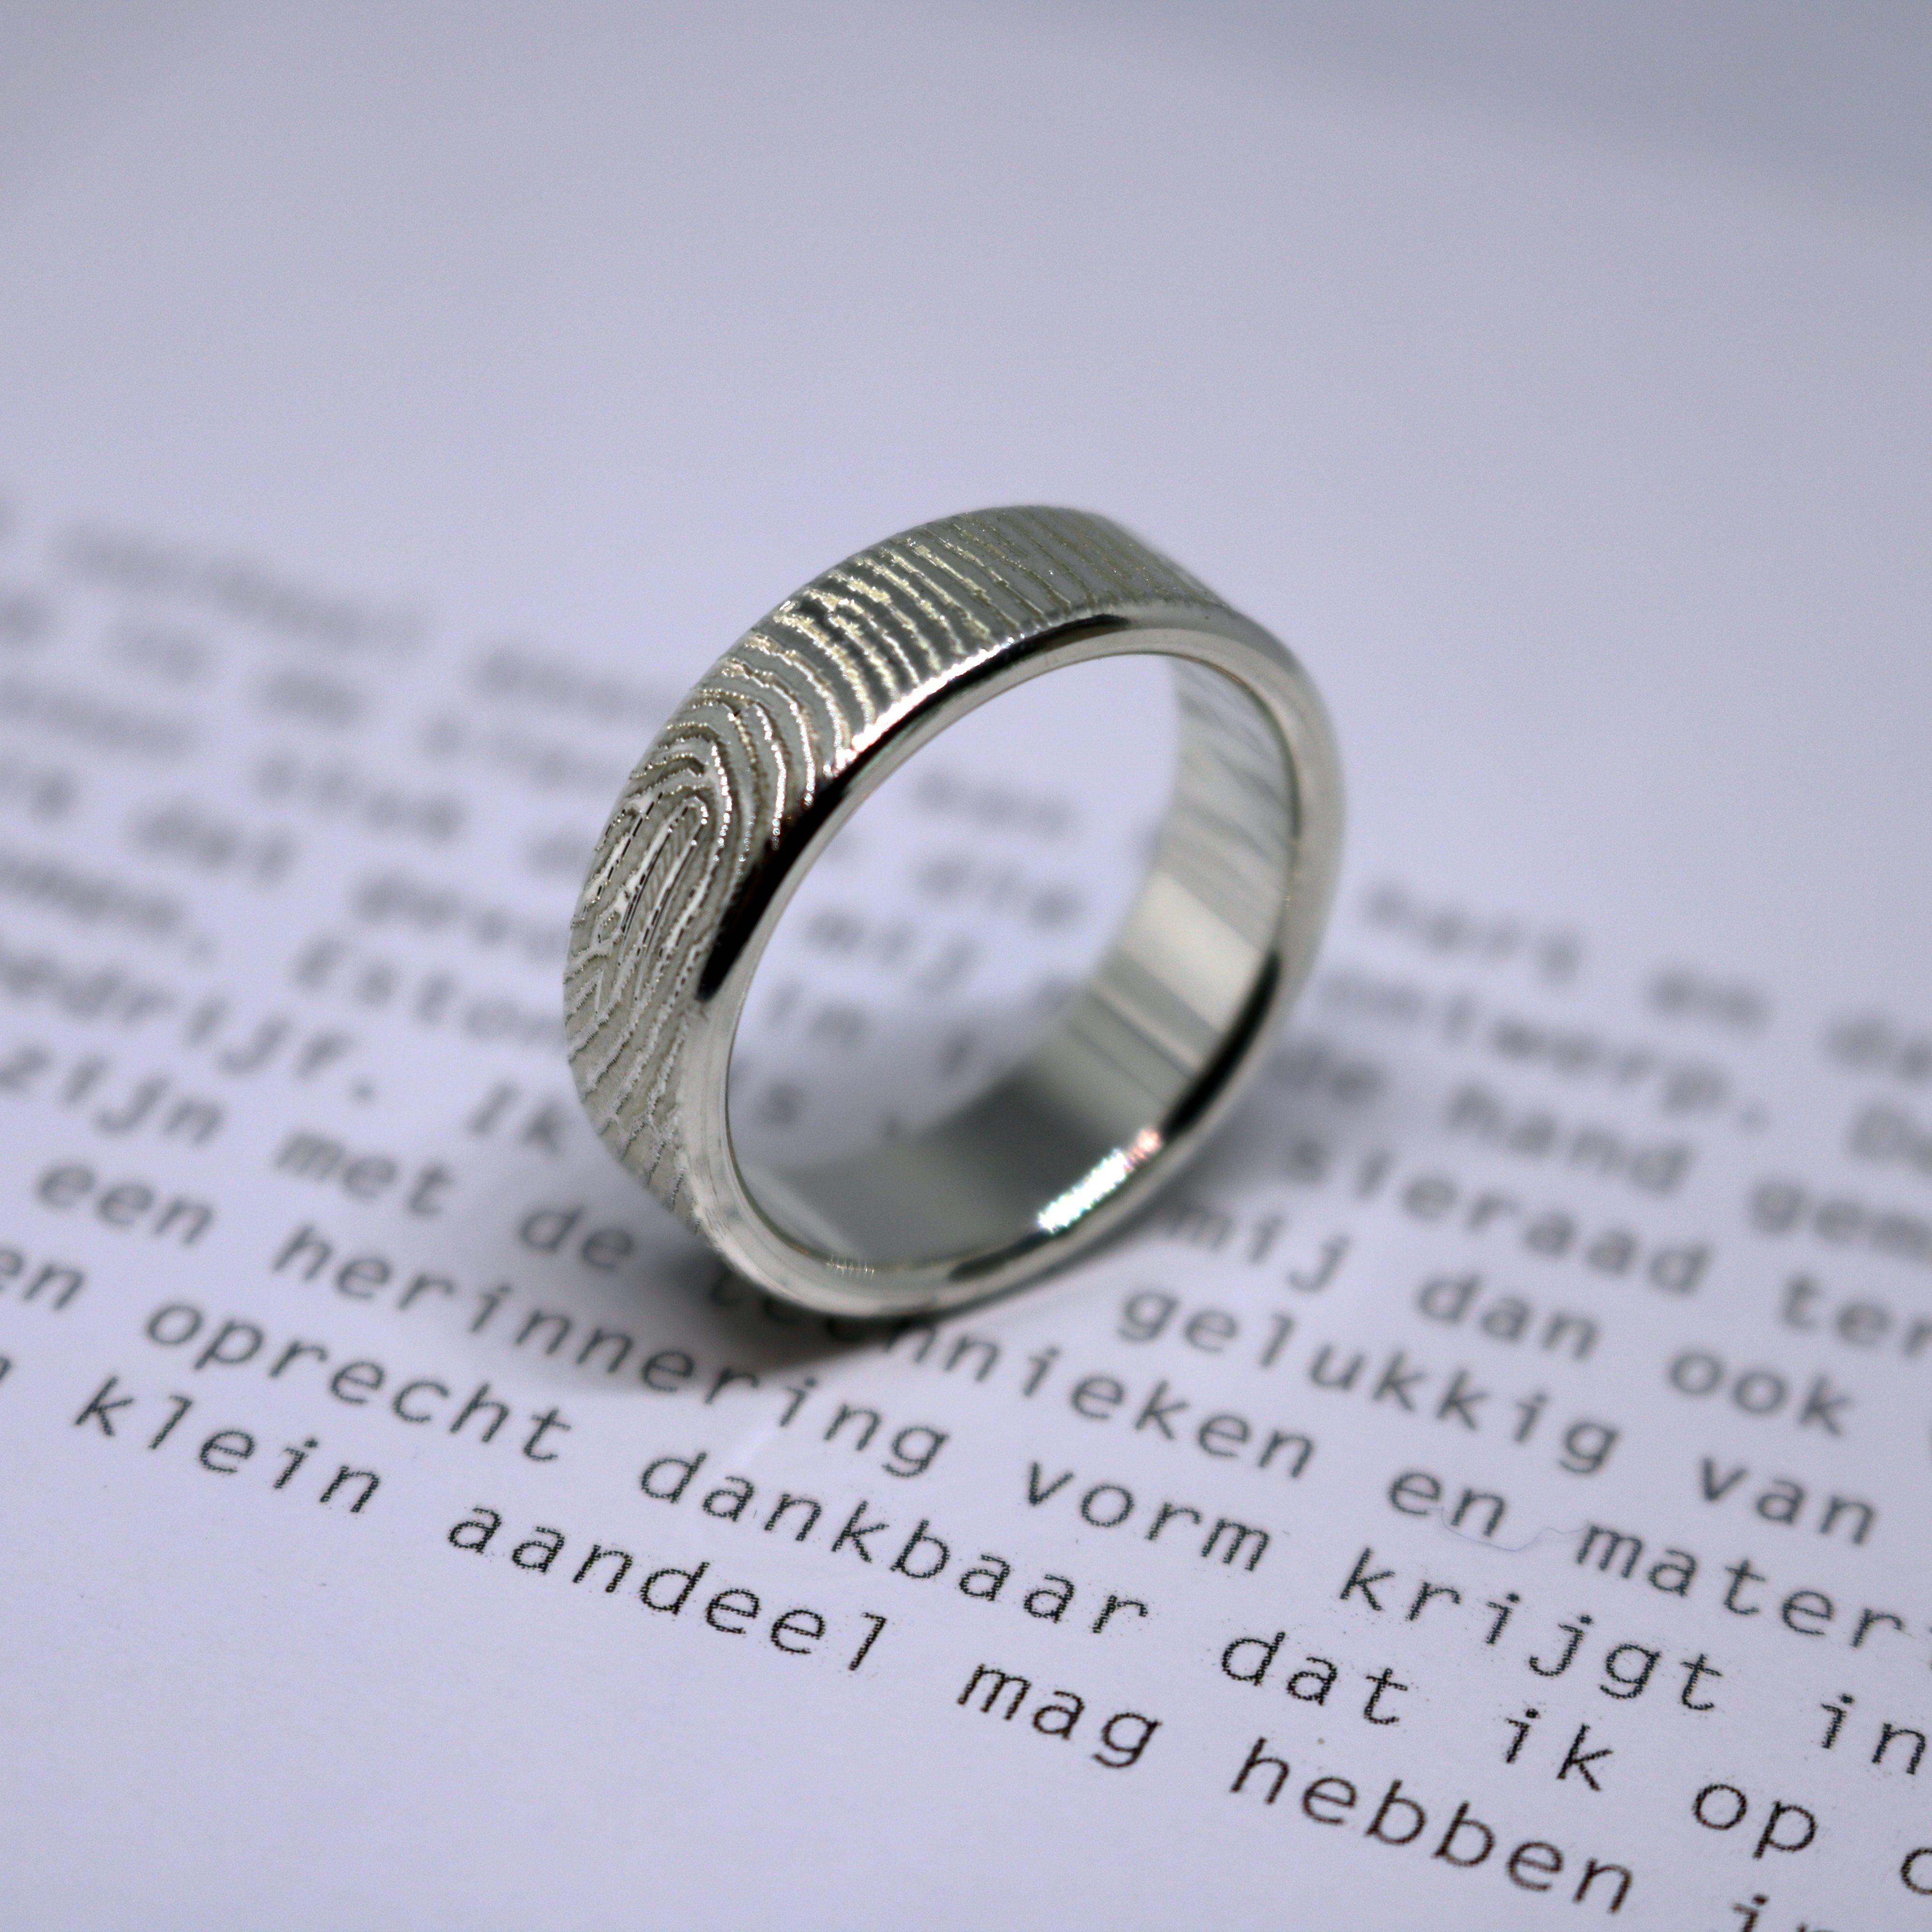 Ring vingerafdruk herinneringssieraad sieraden zilveren ring estona vingerafdruk